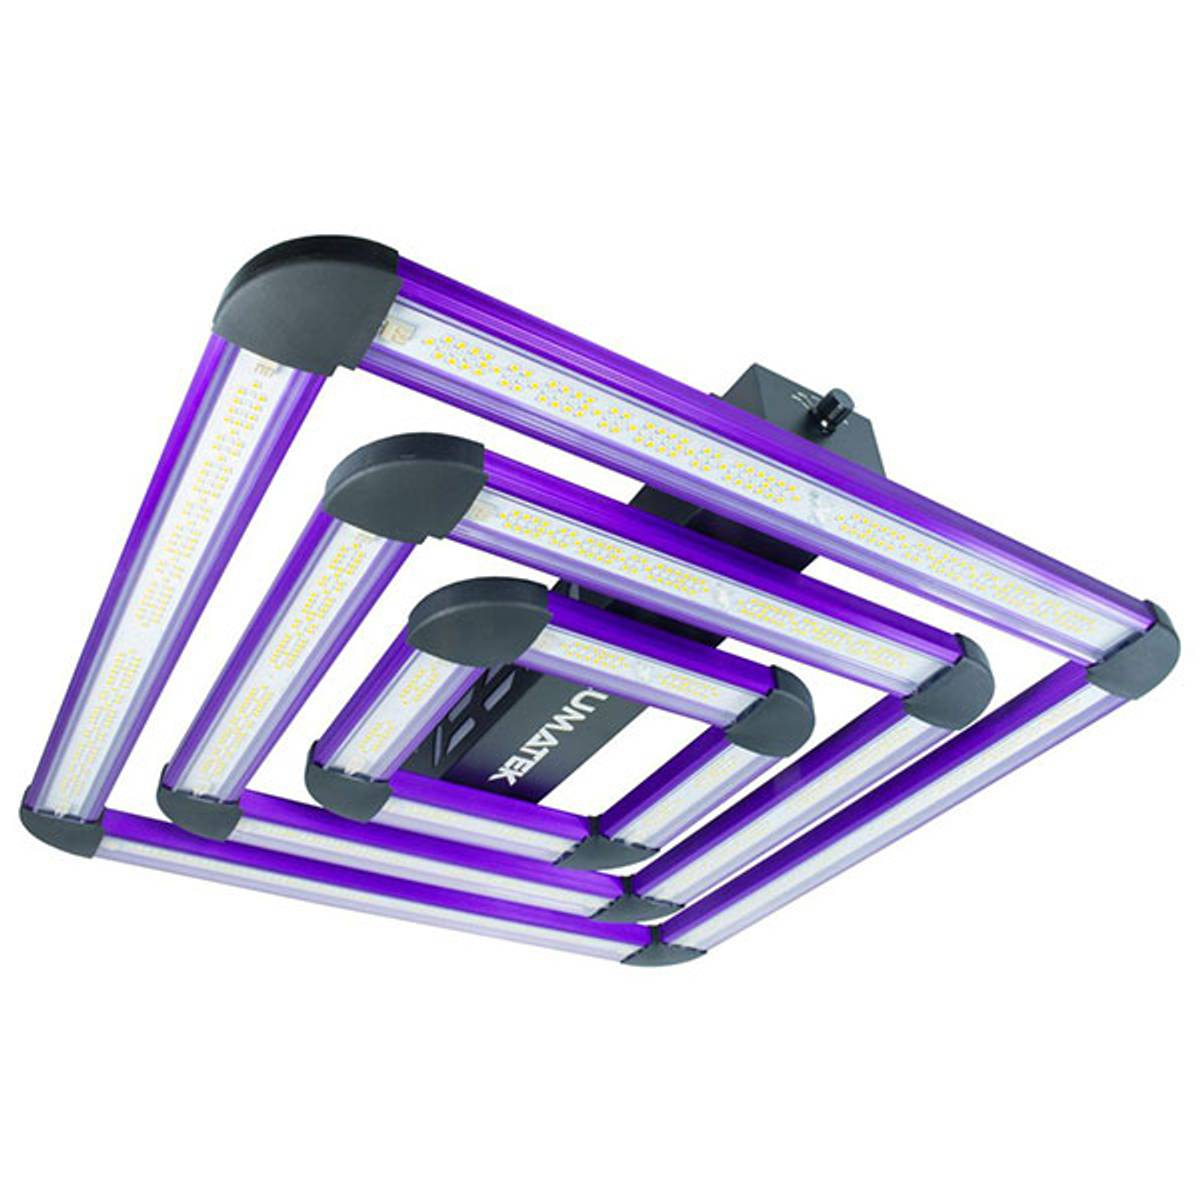 Lumatek Attis 300 W LED Fullspektrum